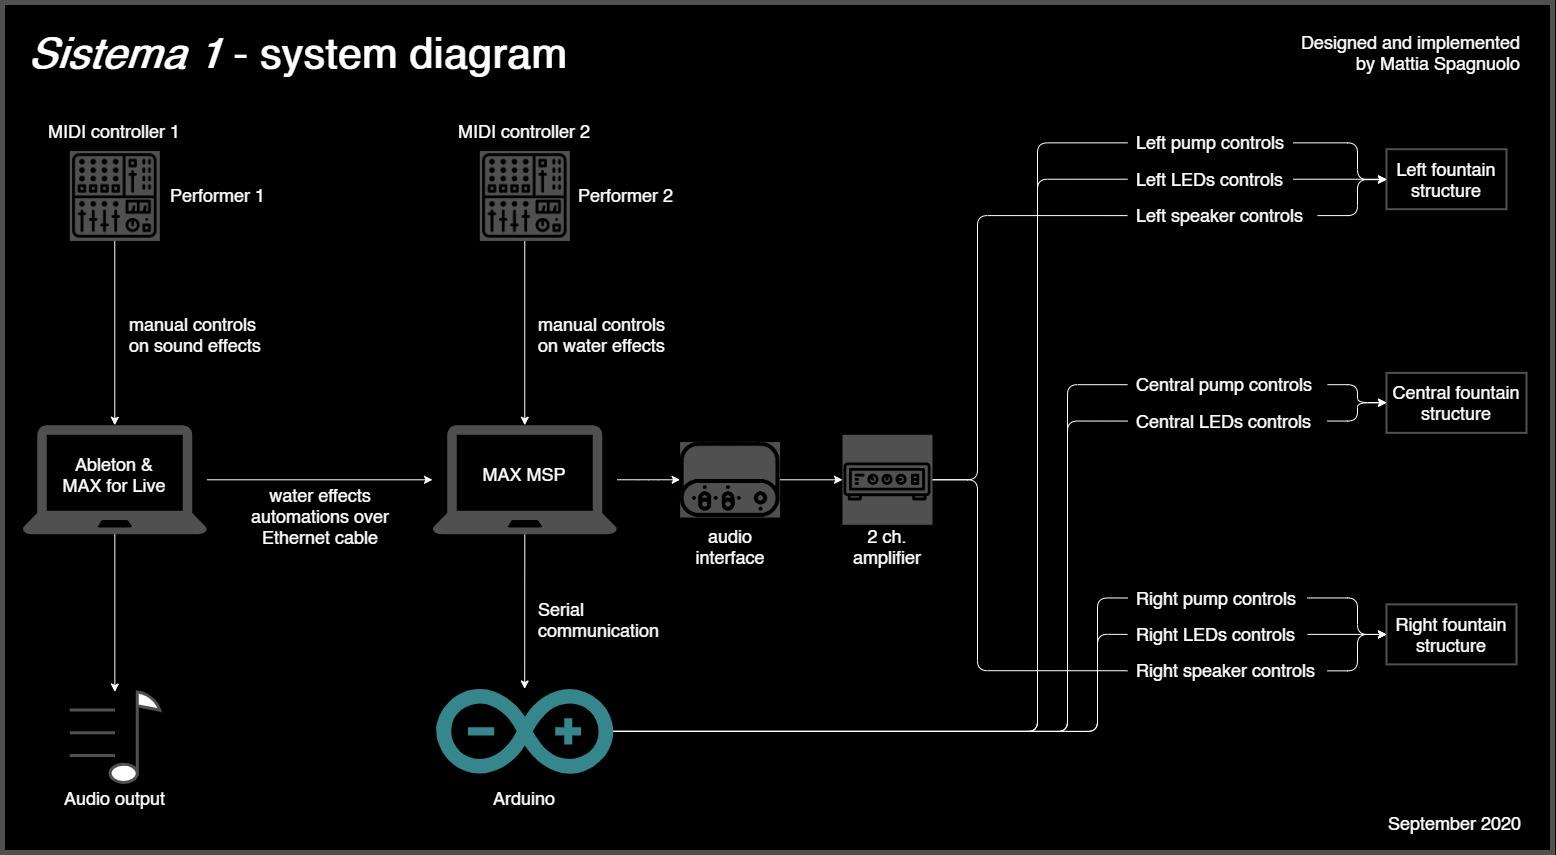 sistema_1-system_diagram